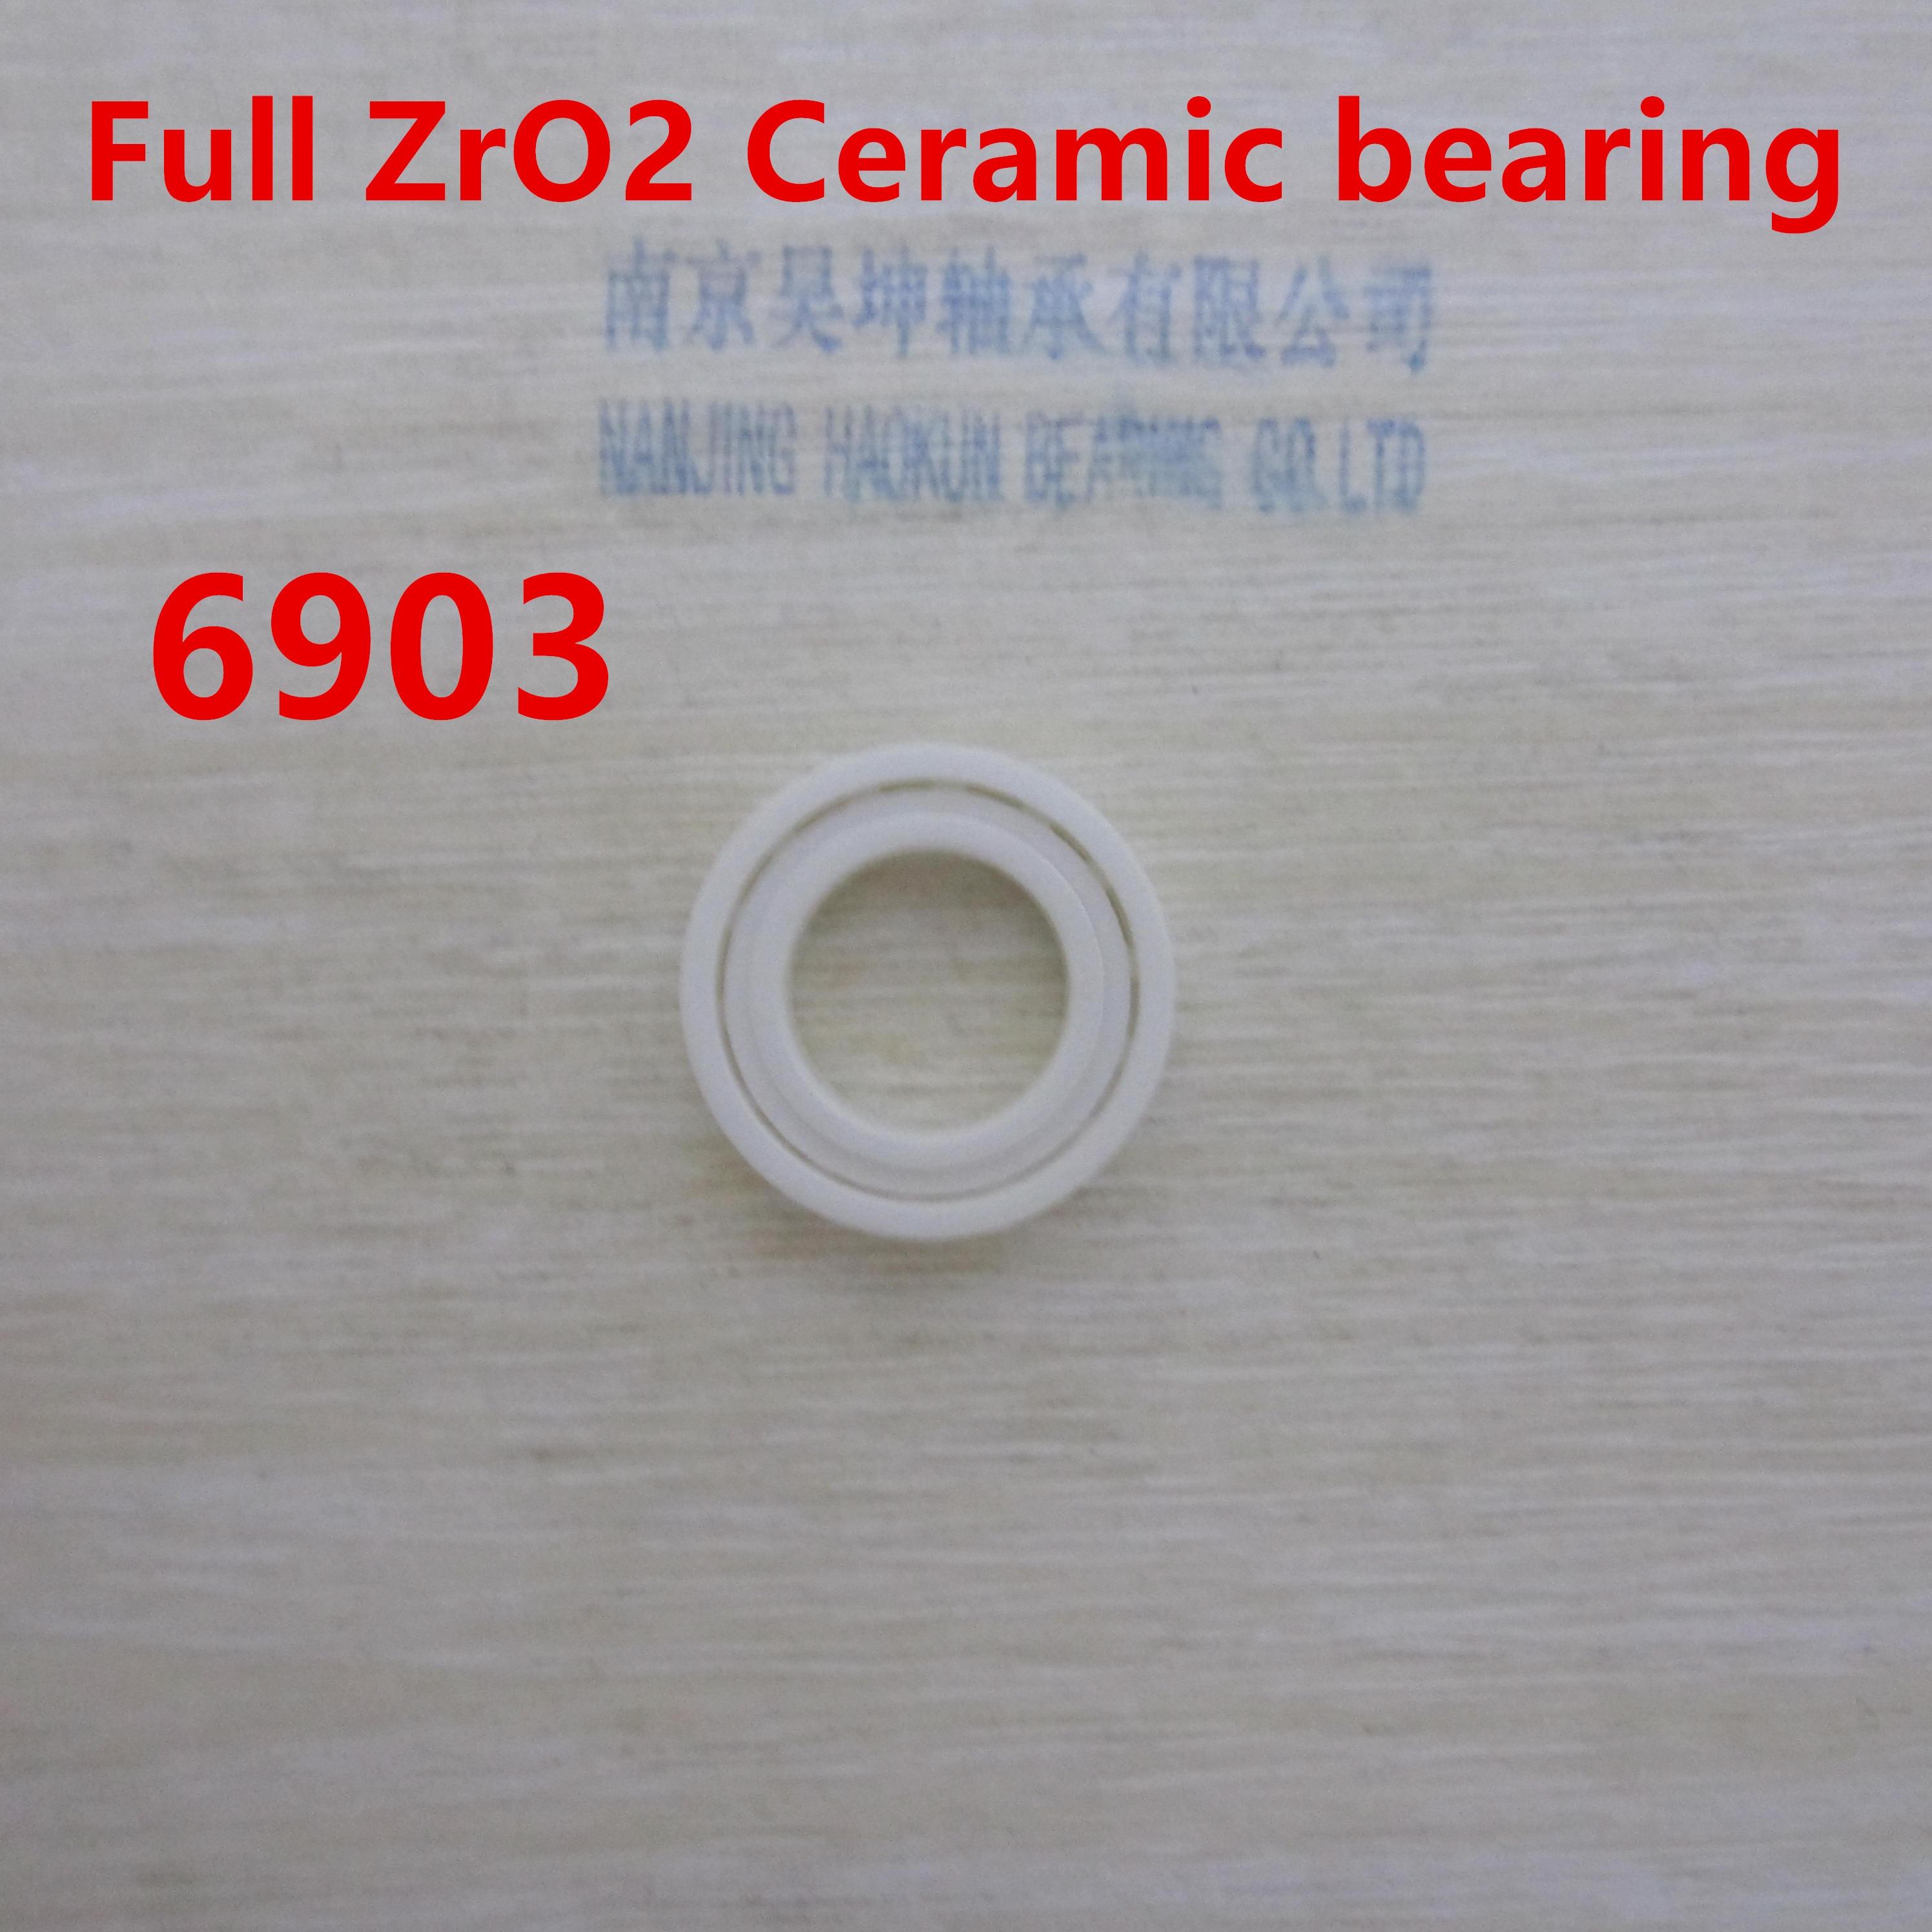 6903 ceramic bearing zro2 full ceramic material 61903 61916 6916 zro2 full ceramic bearing 80x110x16mm